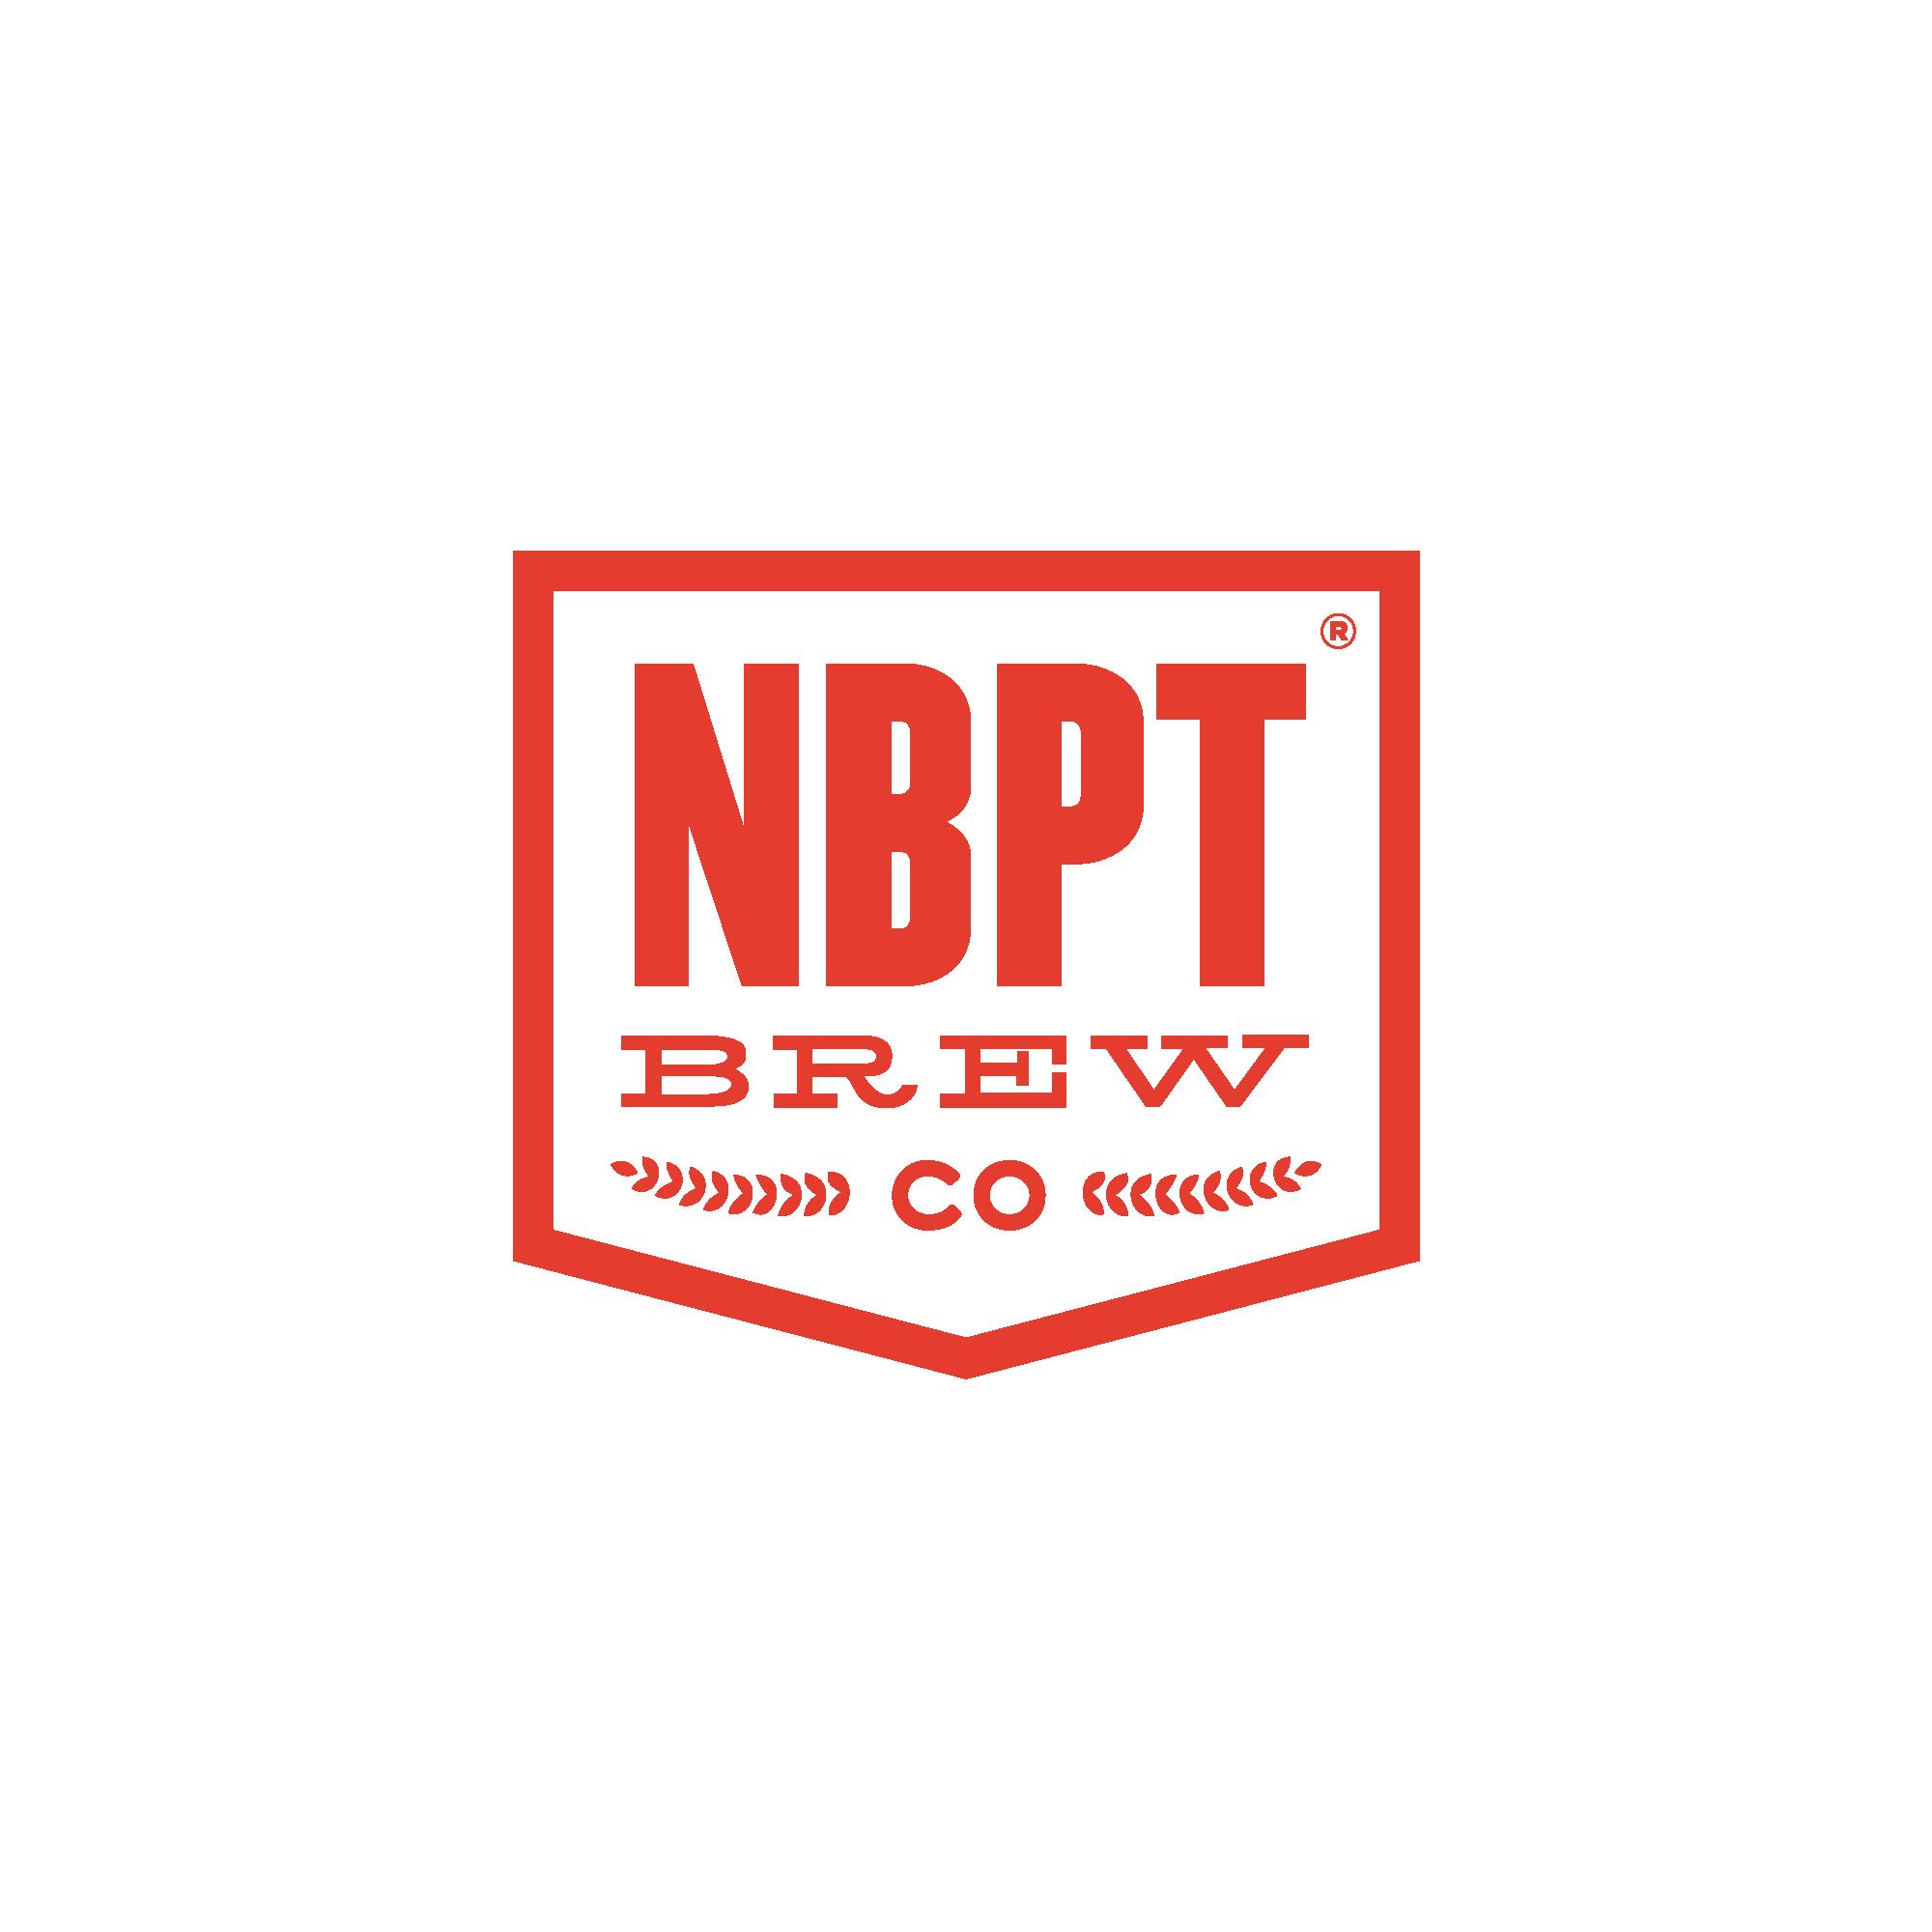 nbptbrewco.png